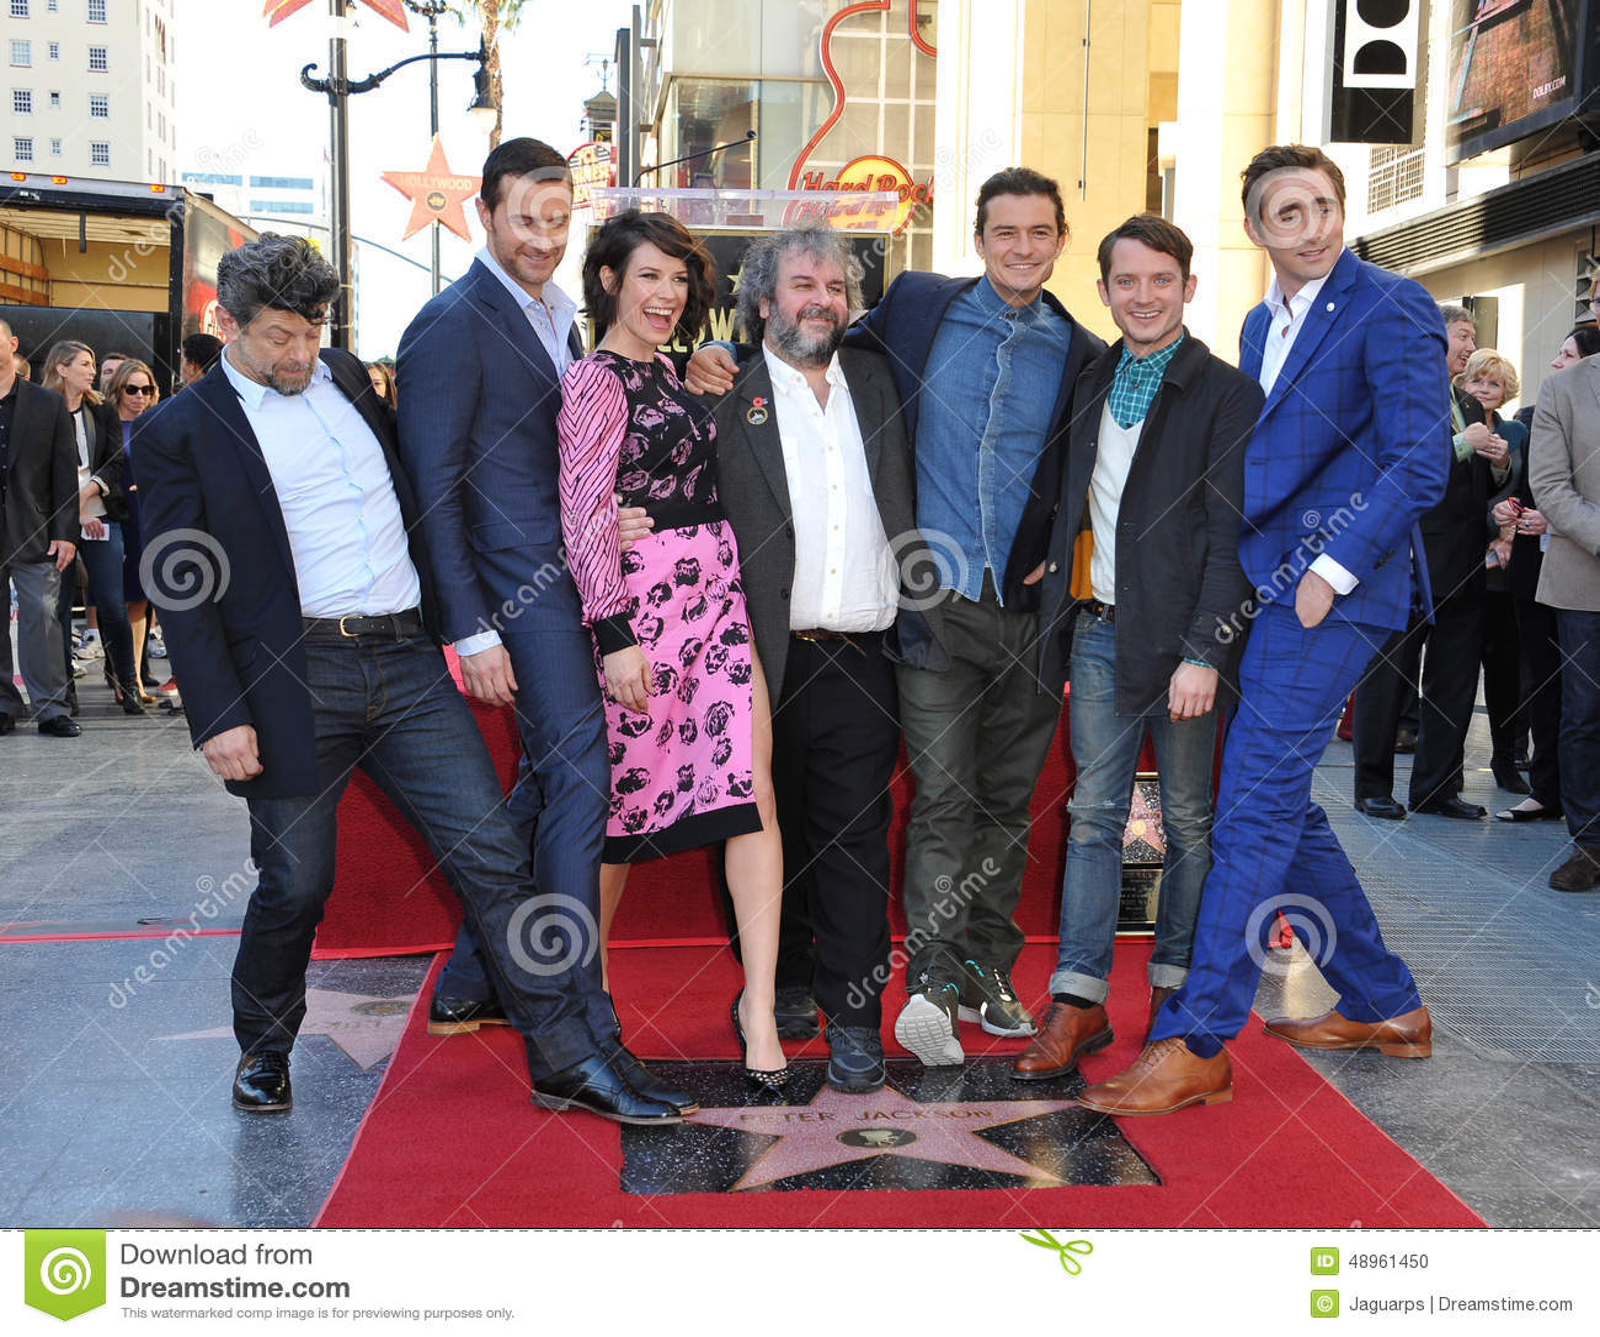 Andy Serkis & Richard Armitage & Evangeline Lilly & Peter Jackson & Orlando Bloom & Elijah Wood & Lee Pace